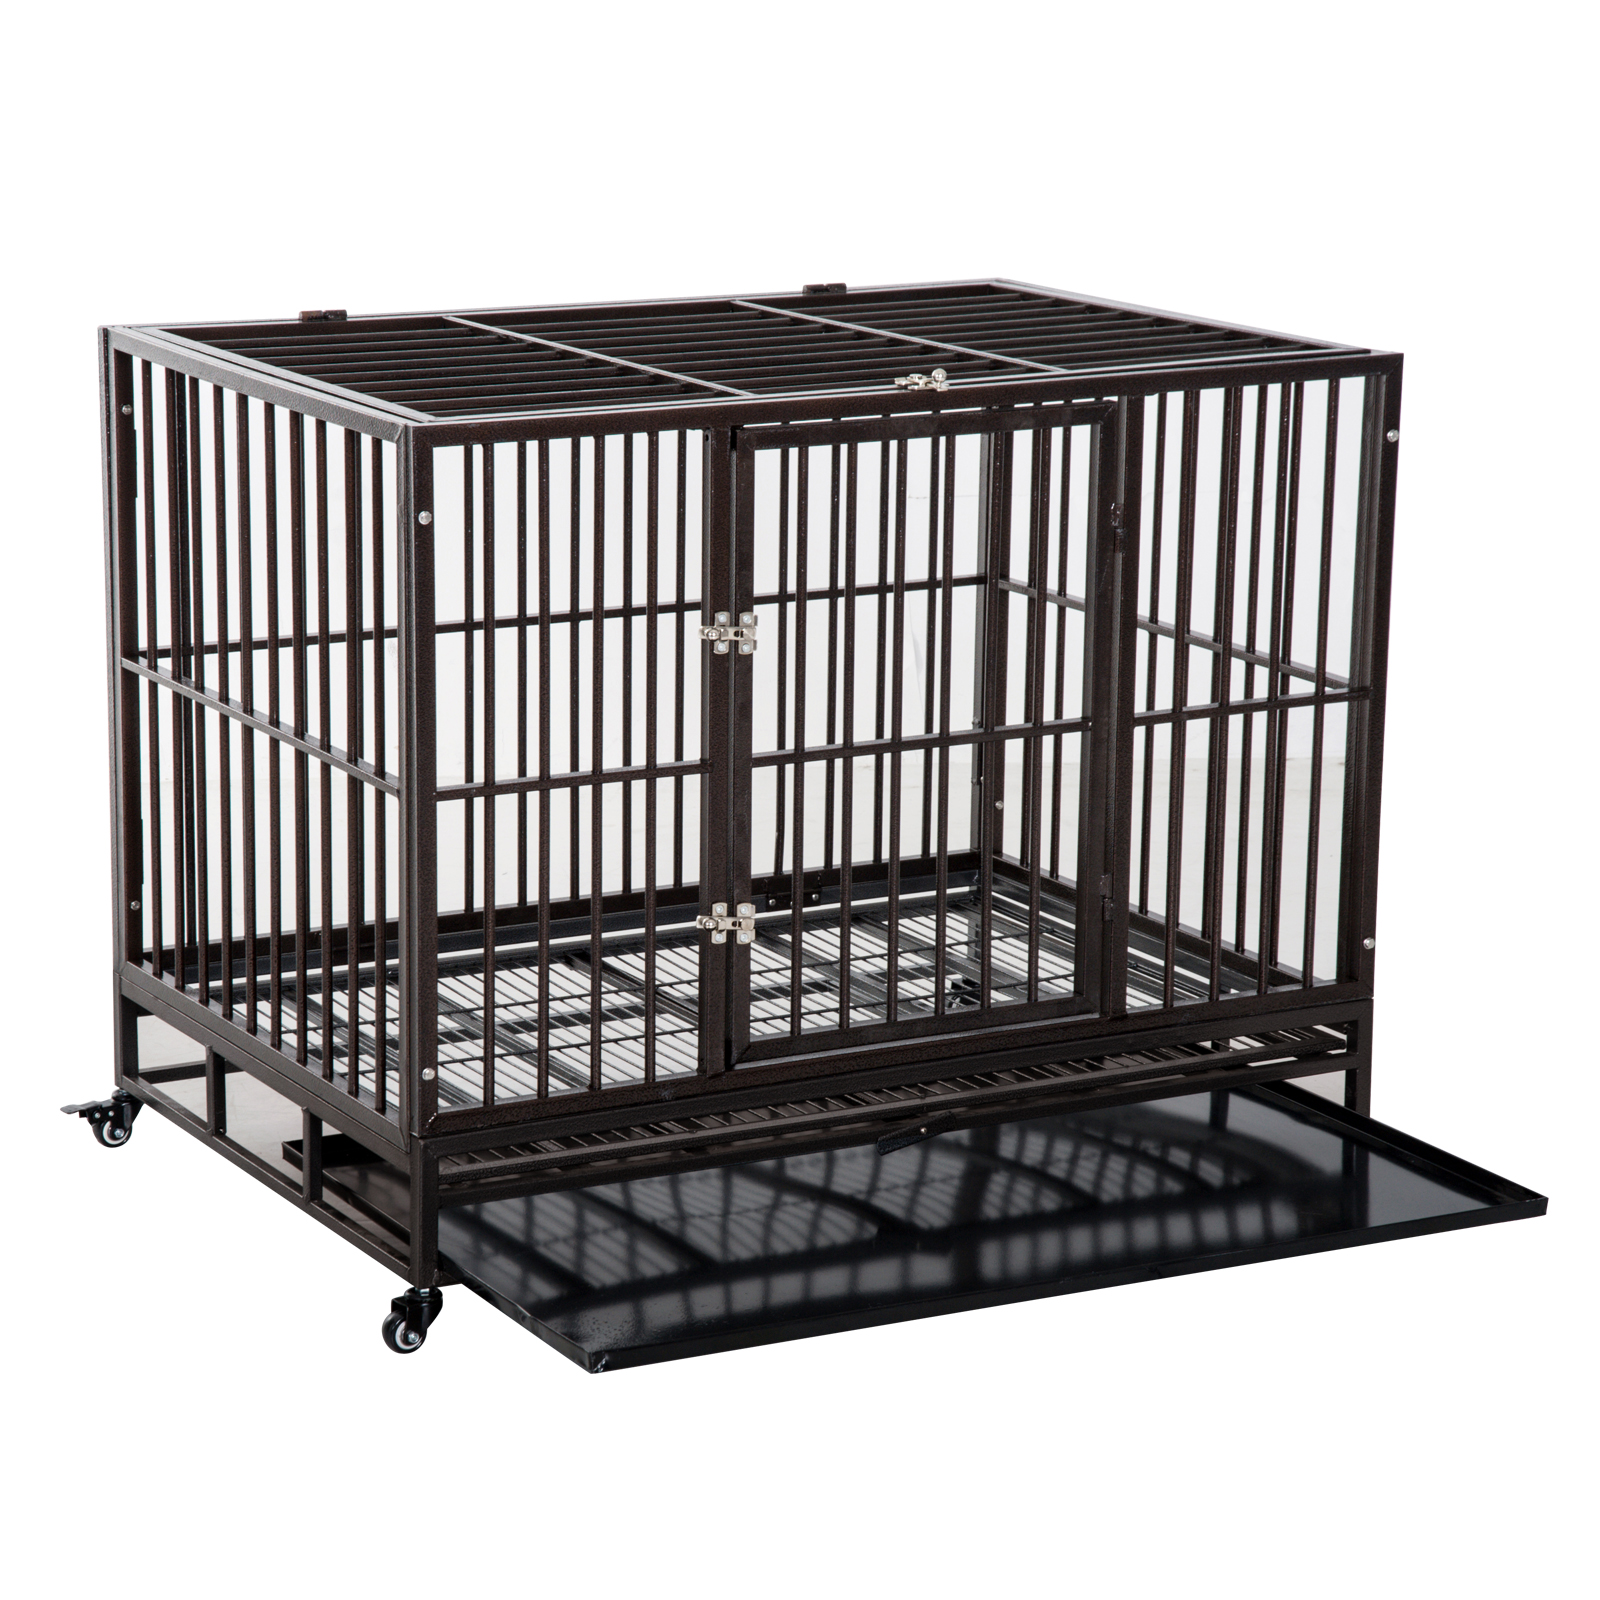 "PawHut 42"" Heavy Duty Steel Dog Crate Kennel Pet Cage w/ Wheels - Brown Vein"